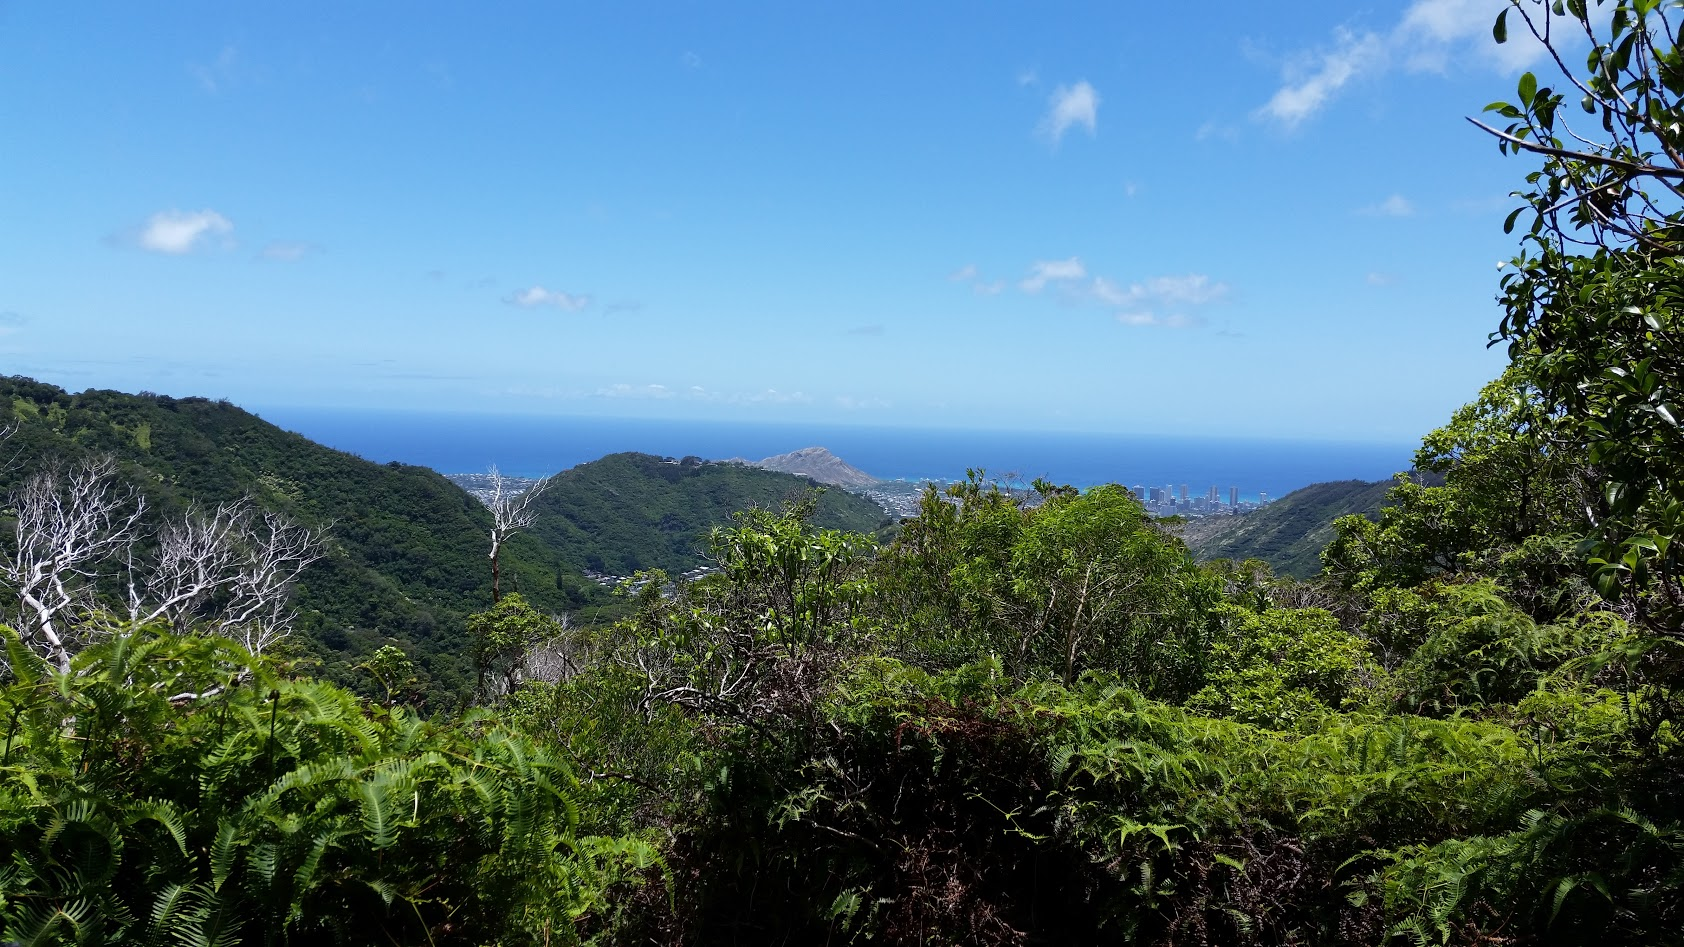 Oahu, looking towards Waikiki from Ka'au crater trail